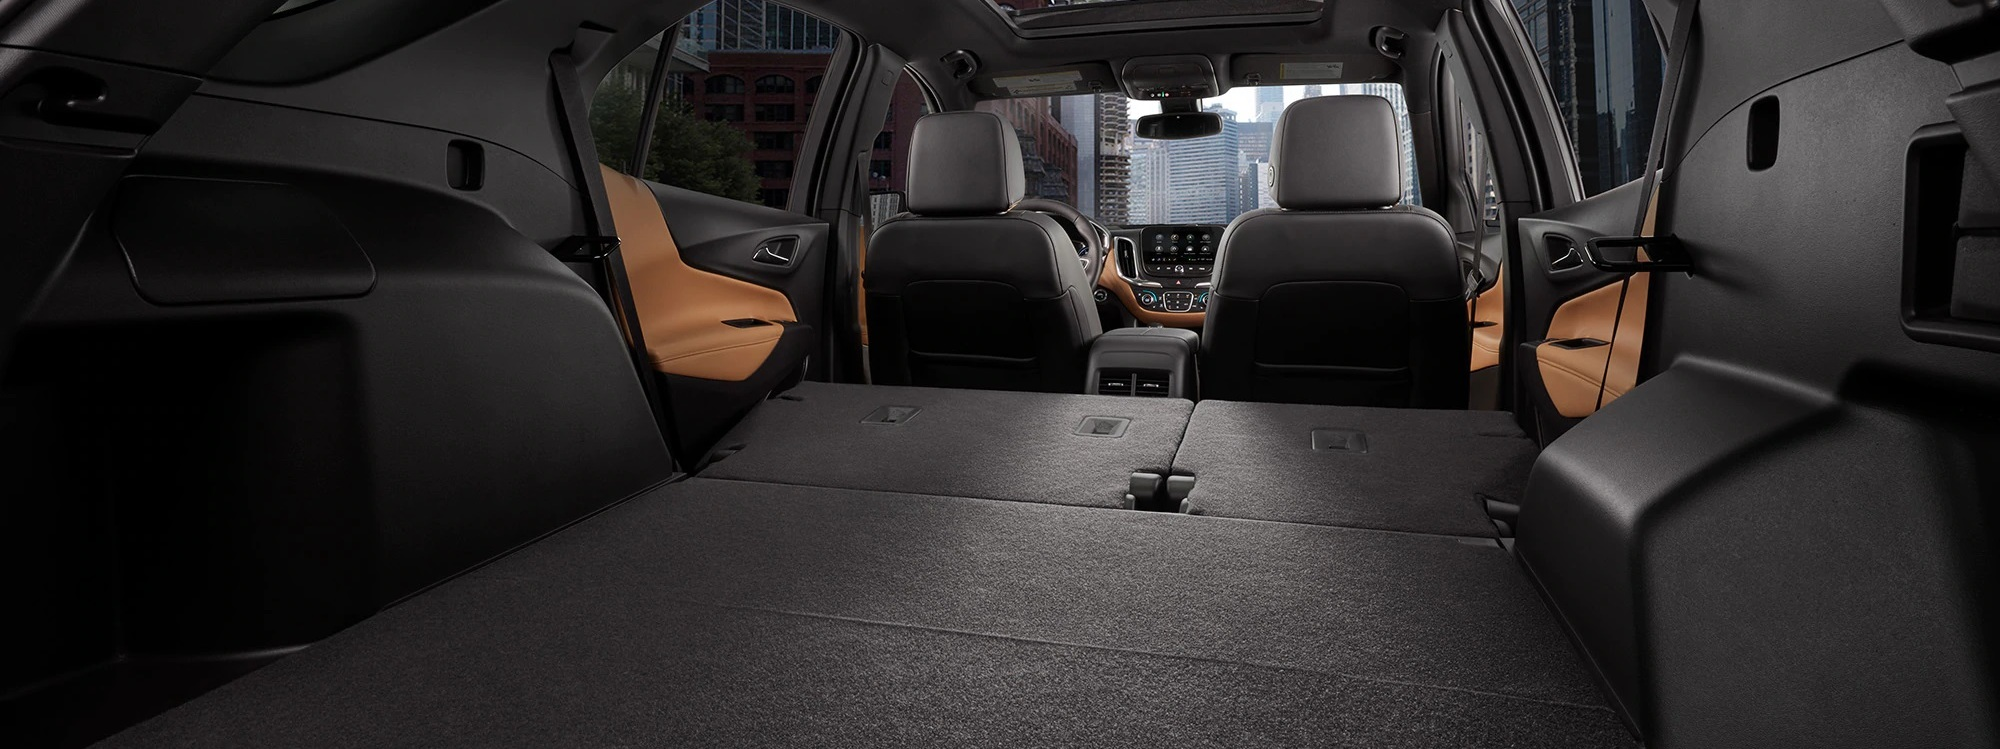 2020 Chevrolet Equinox Cargo Area